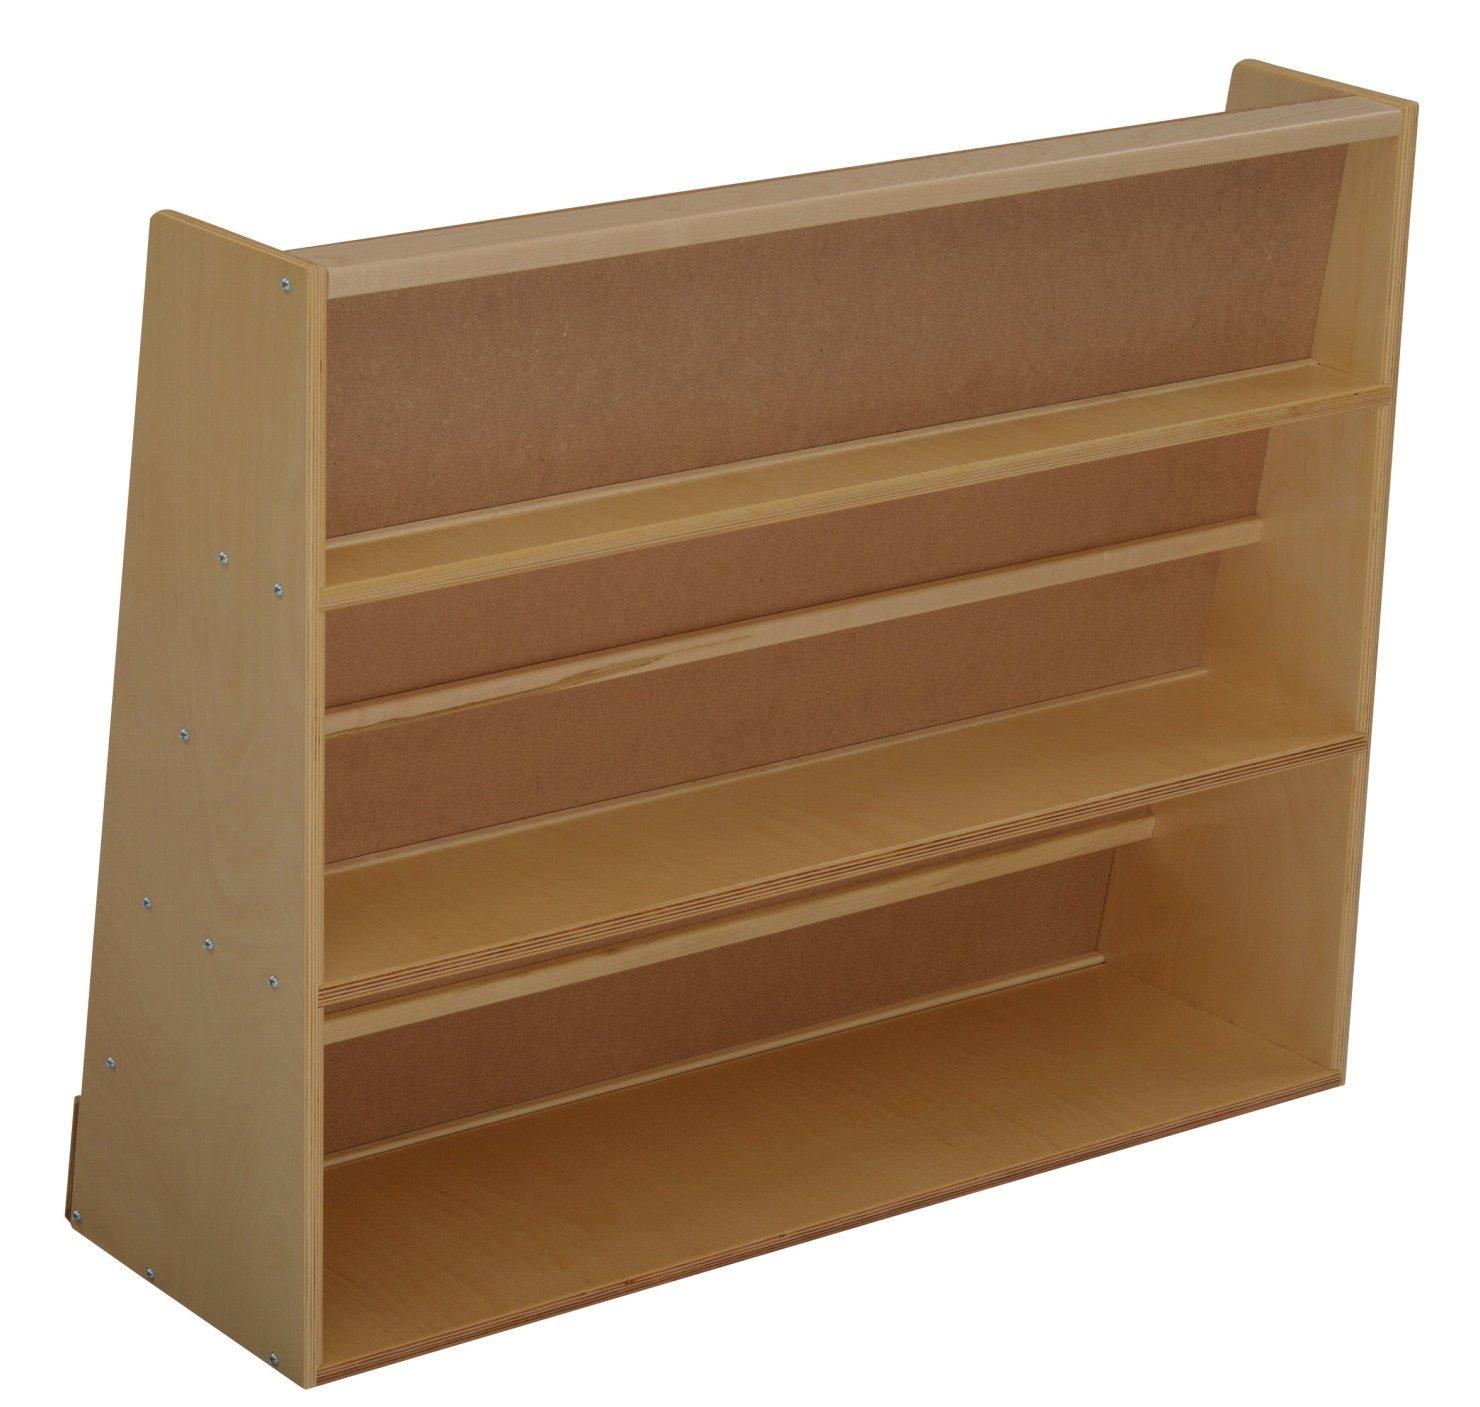 Bird in Hand 068675 Durable Book Display Stand, 5-Shelves, All-Birch Veneer Panel, 4-Coat UV Acrylic, 29'' x 36'' x 12'', Natural Wood Tone